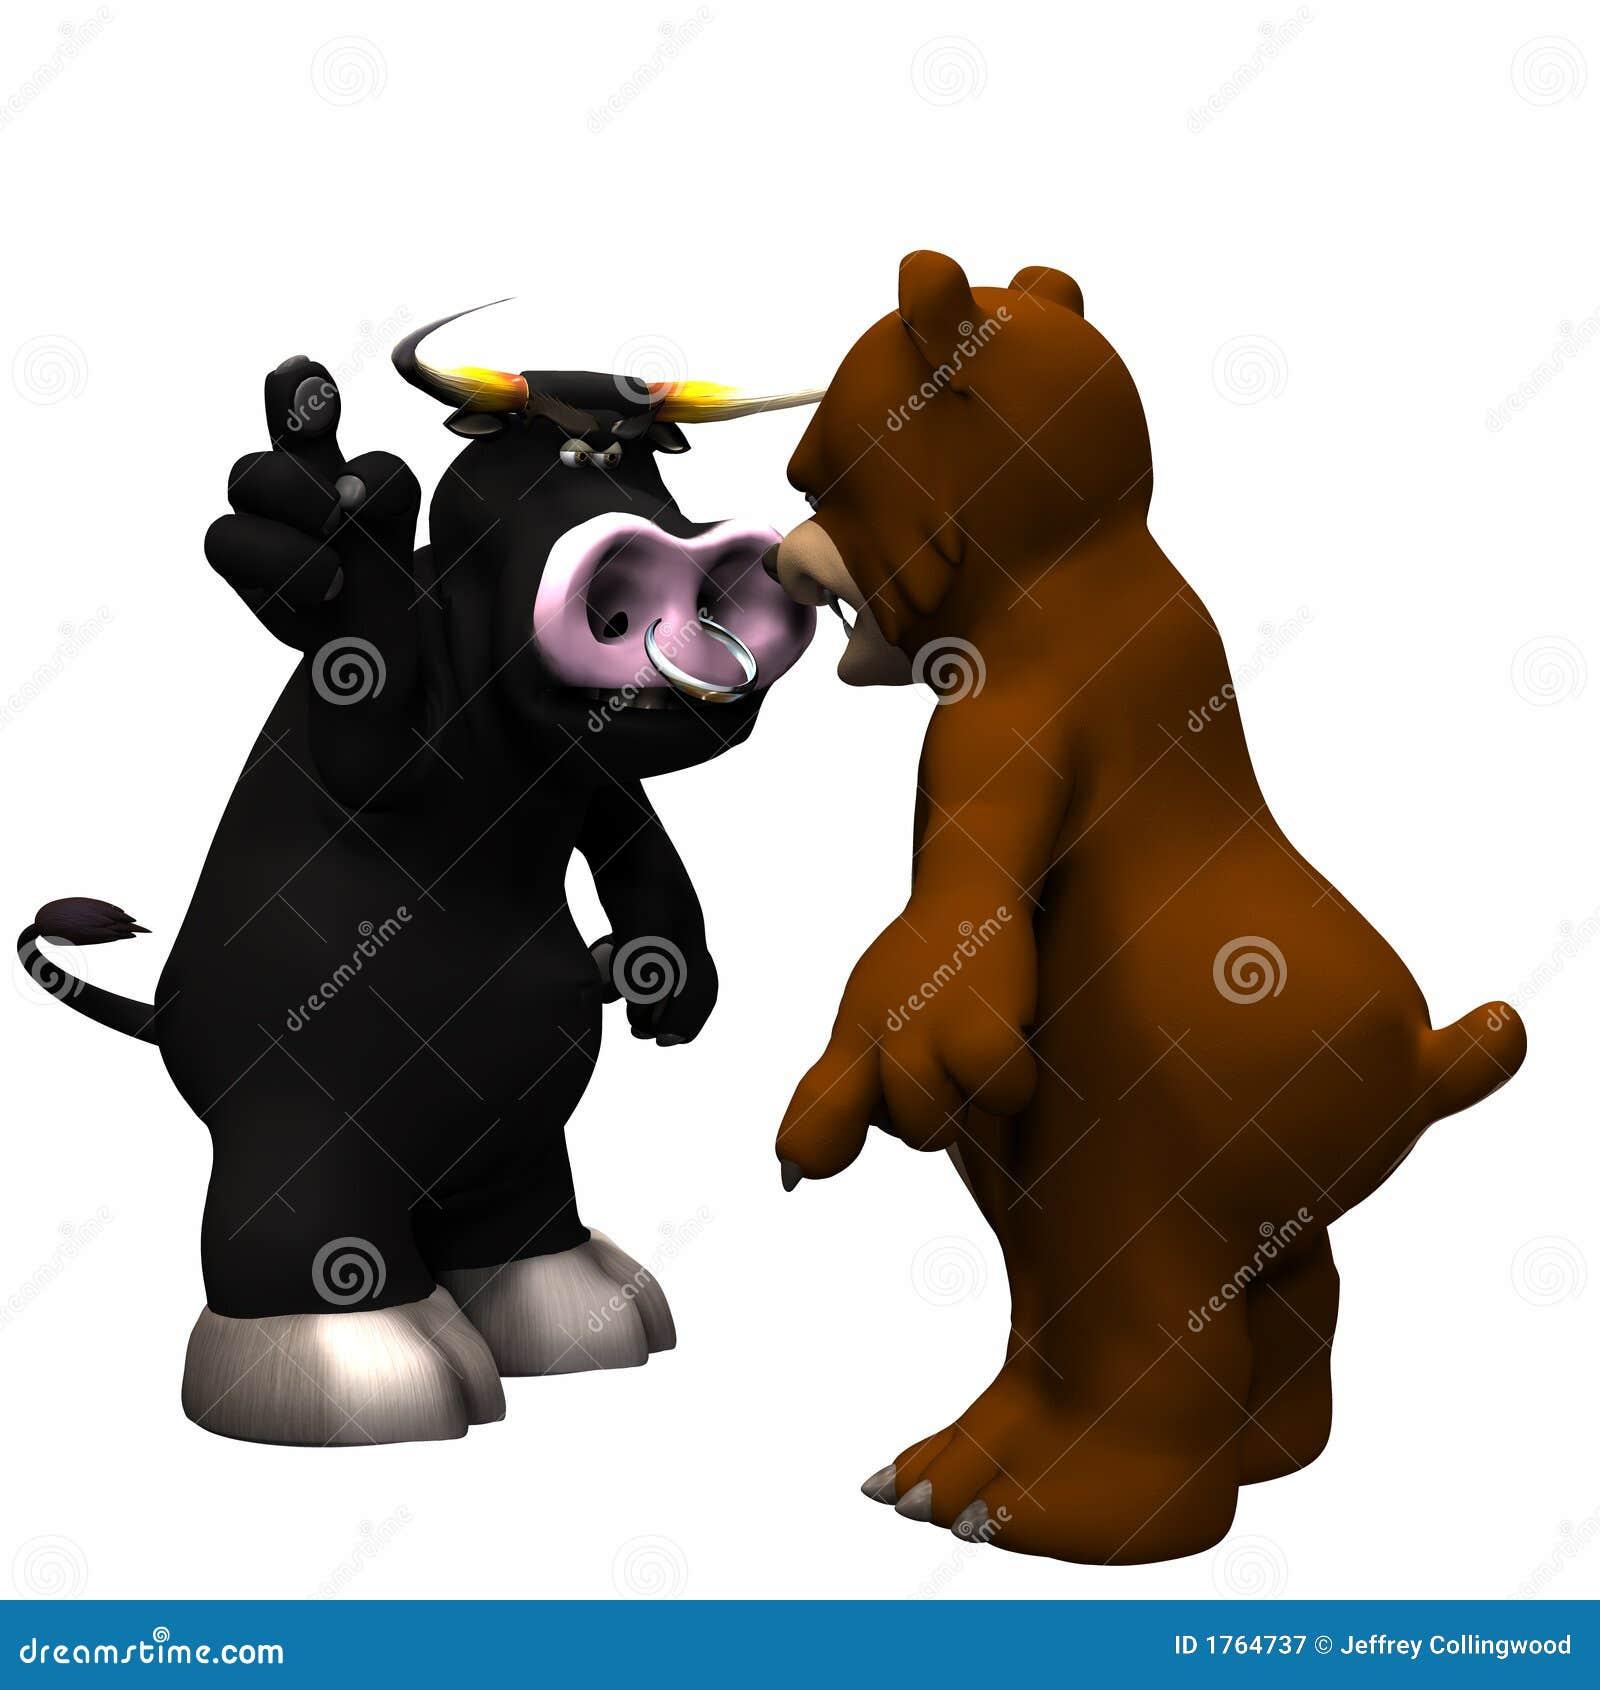 A Bear Market Bull vs Bear Market